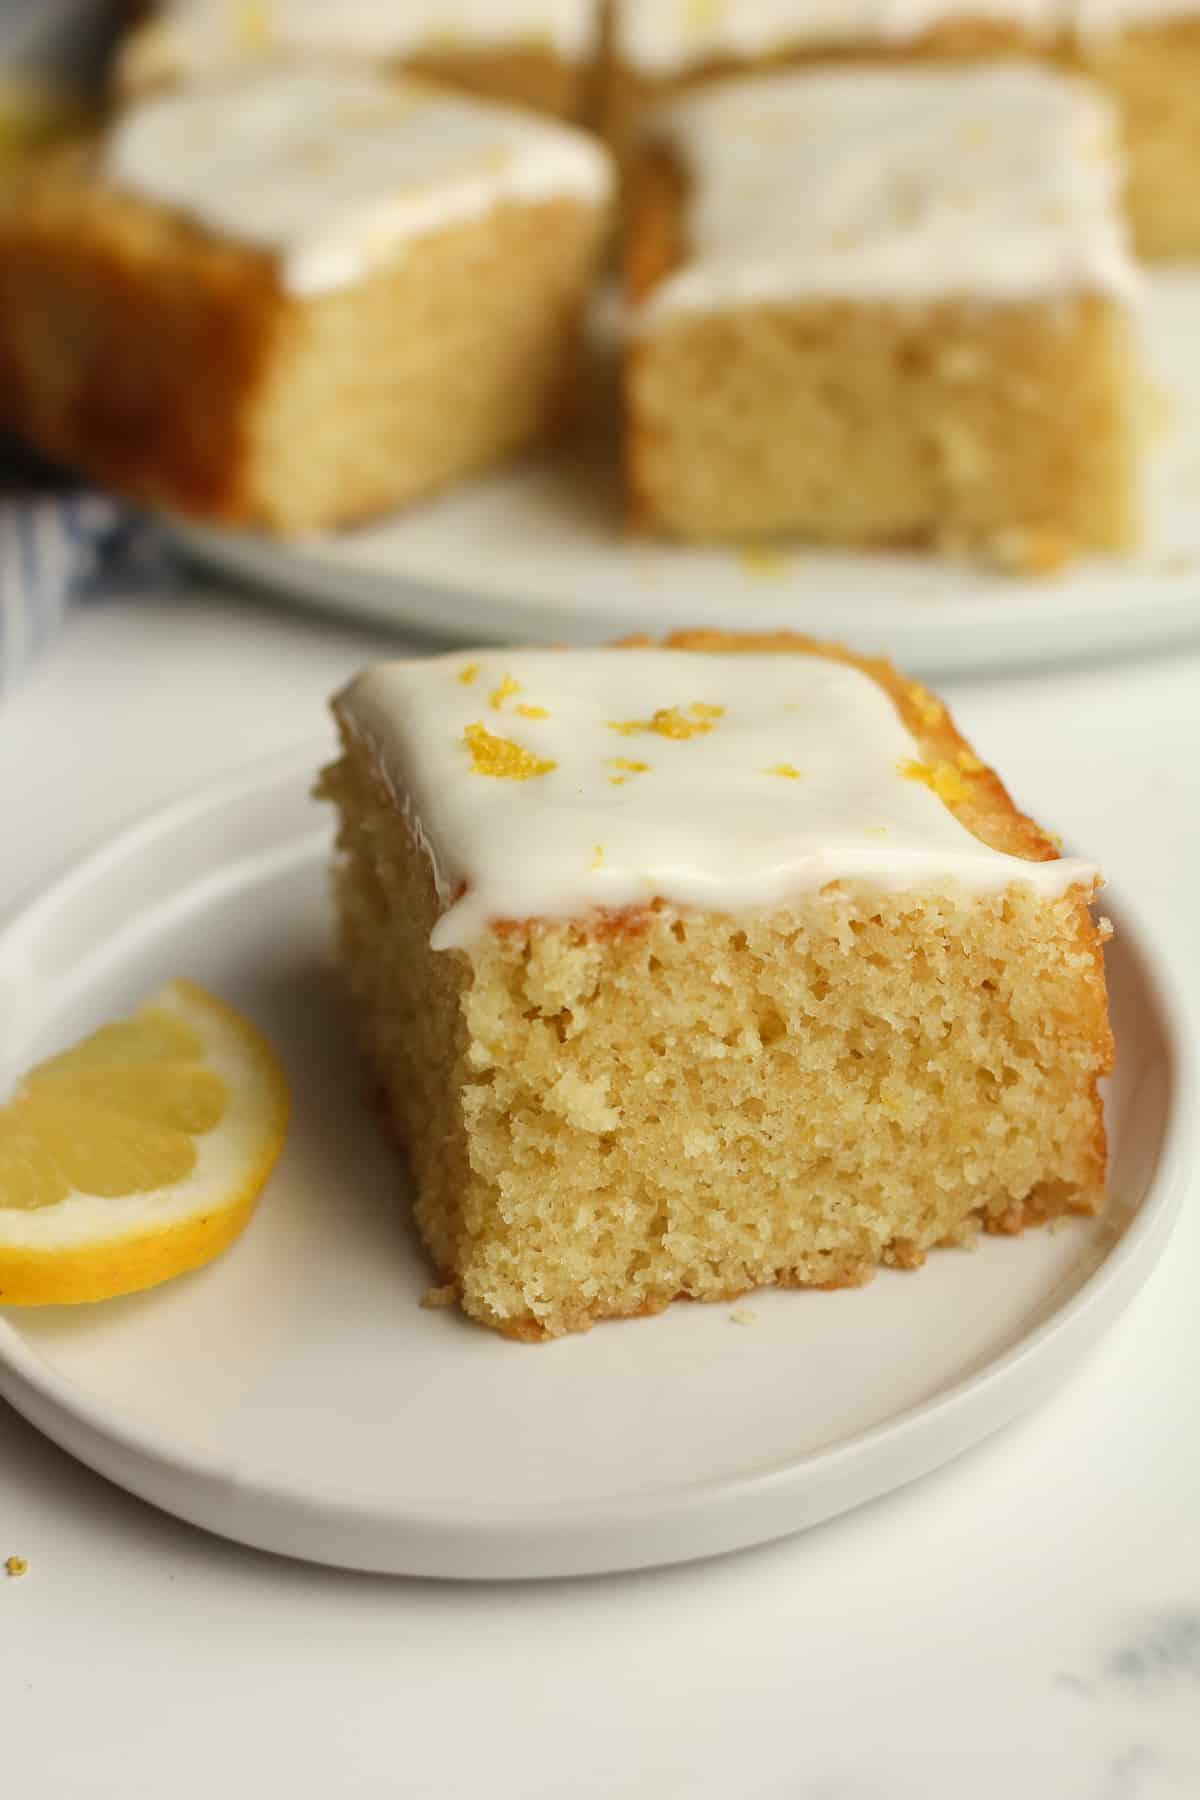 Side shot of a slice of lemon cake.